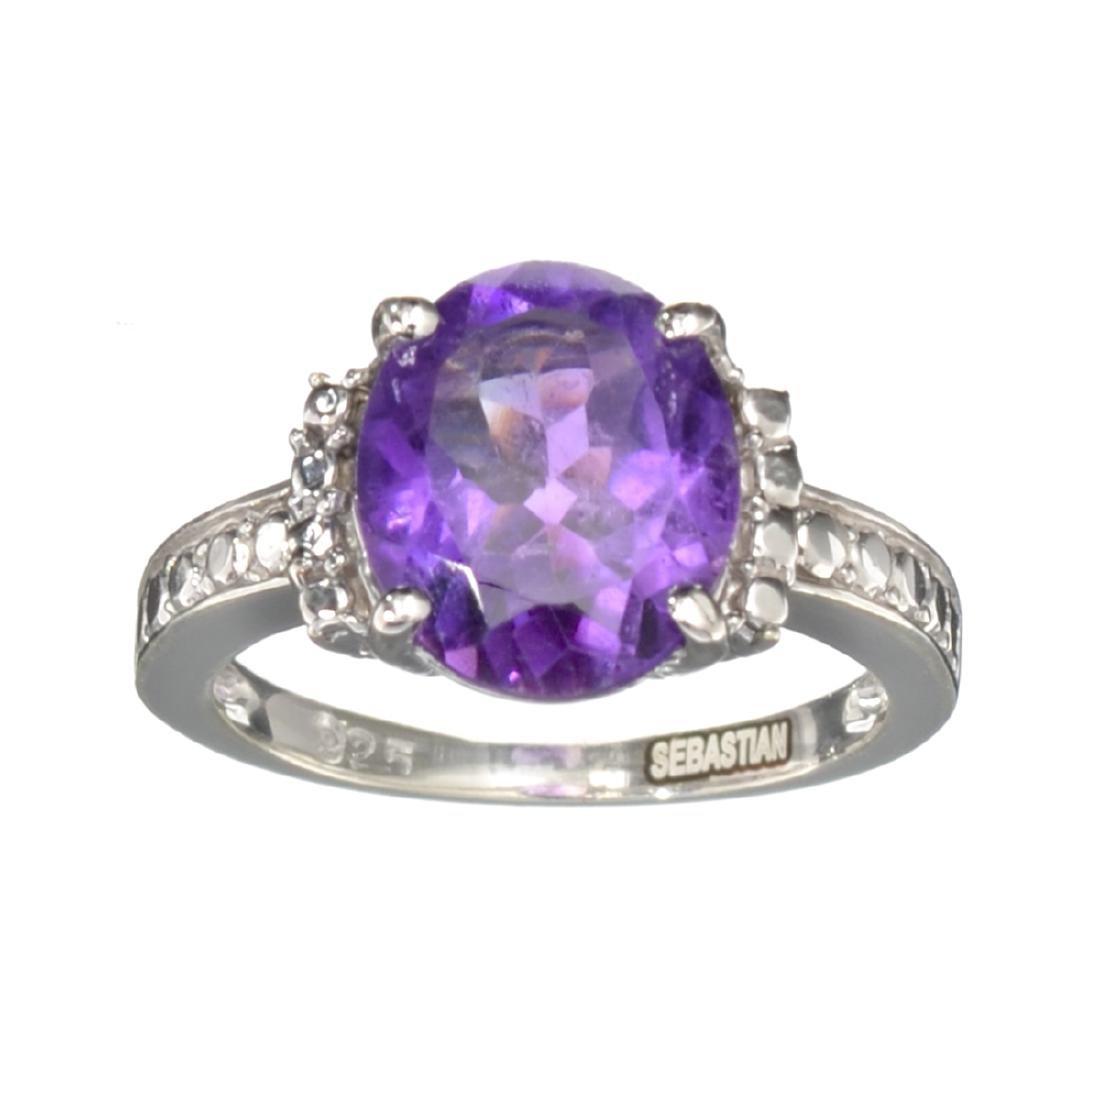 APP: 0.5k Fine Jewelry Designer Sebastian, 3.32CT Oval